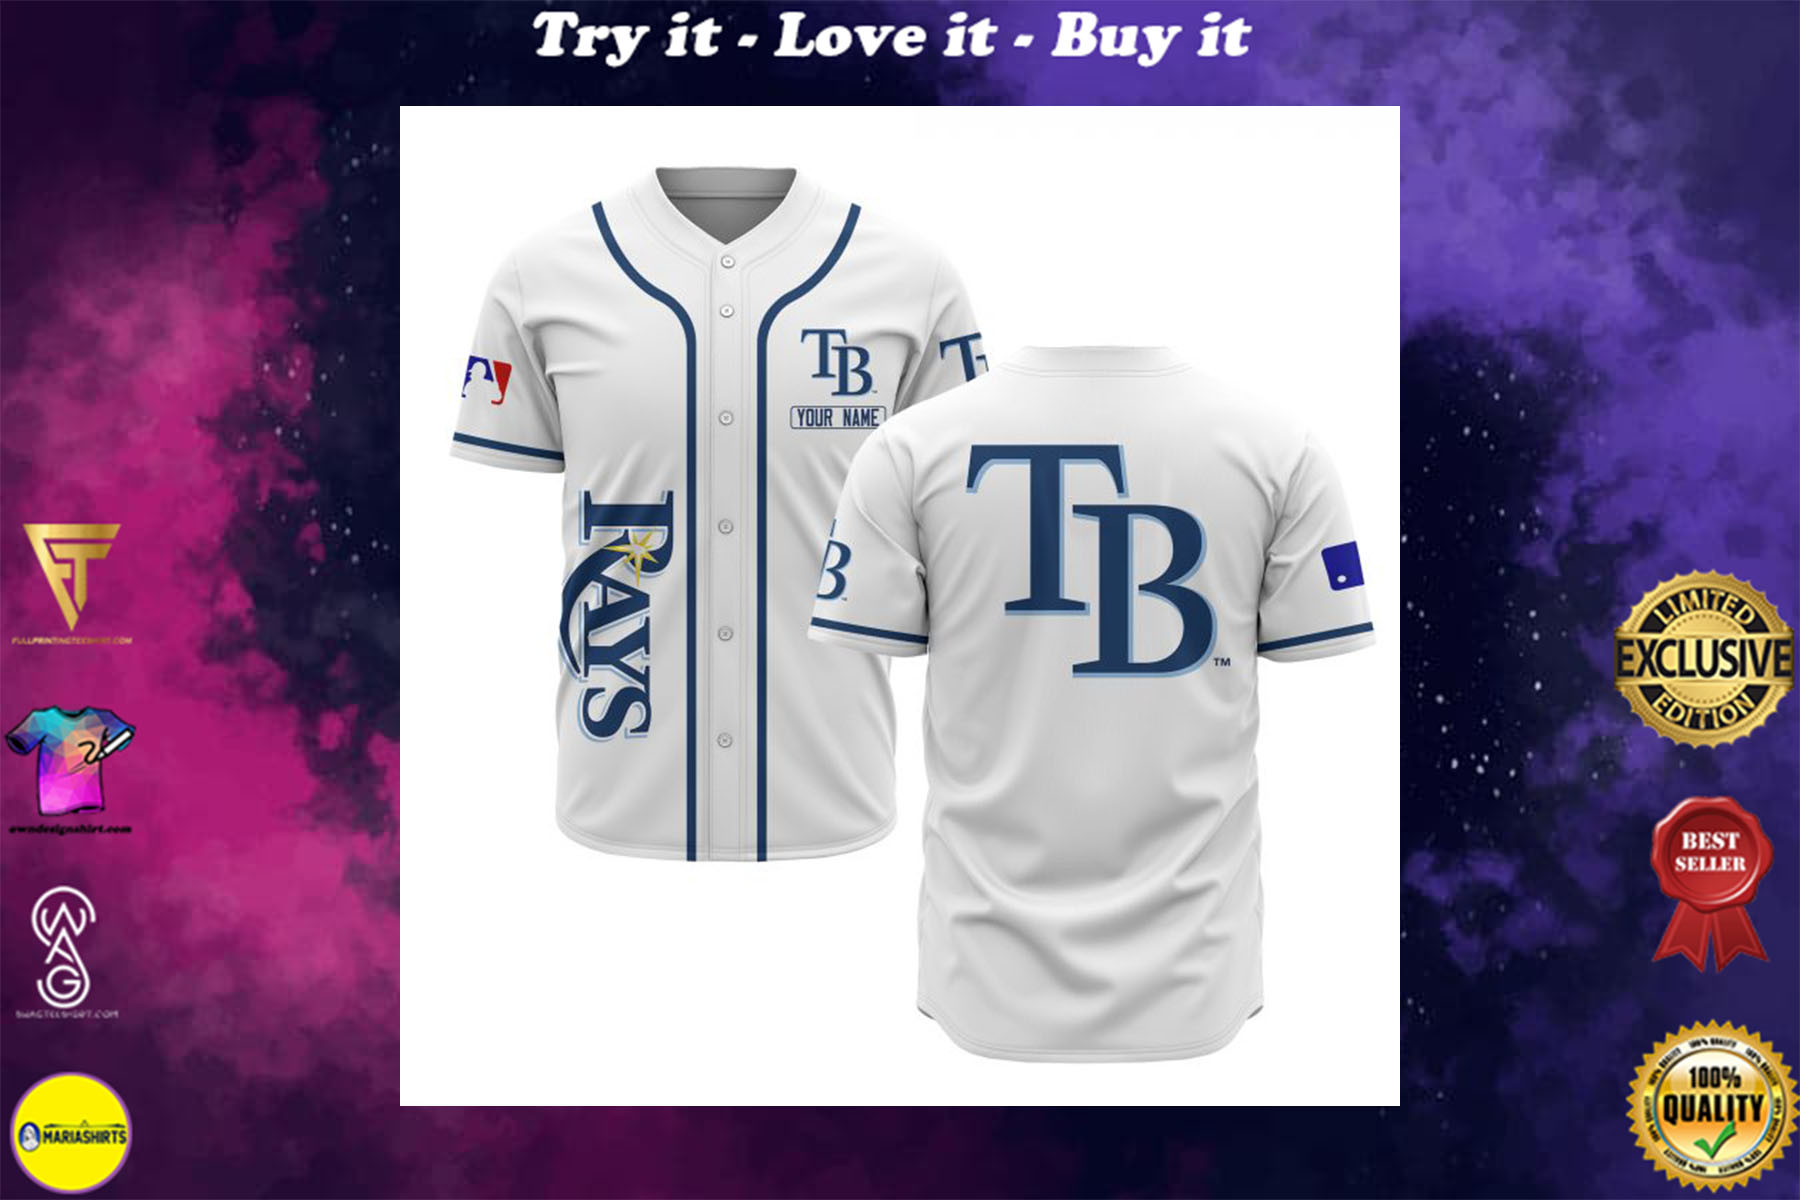 [special edition] custom name tampa bay rays baseball shirt - maria